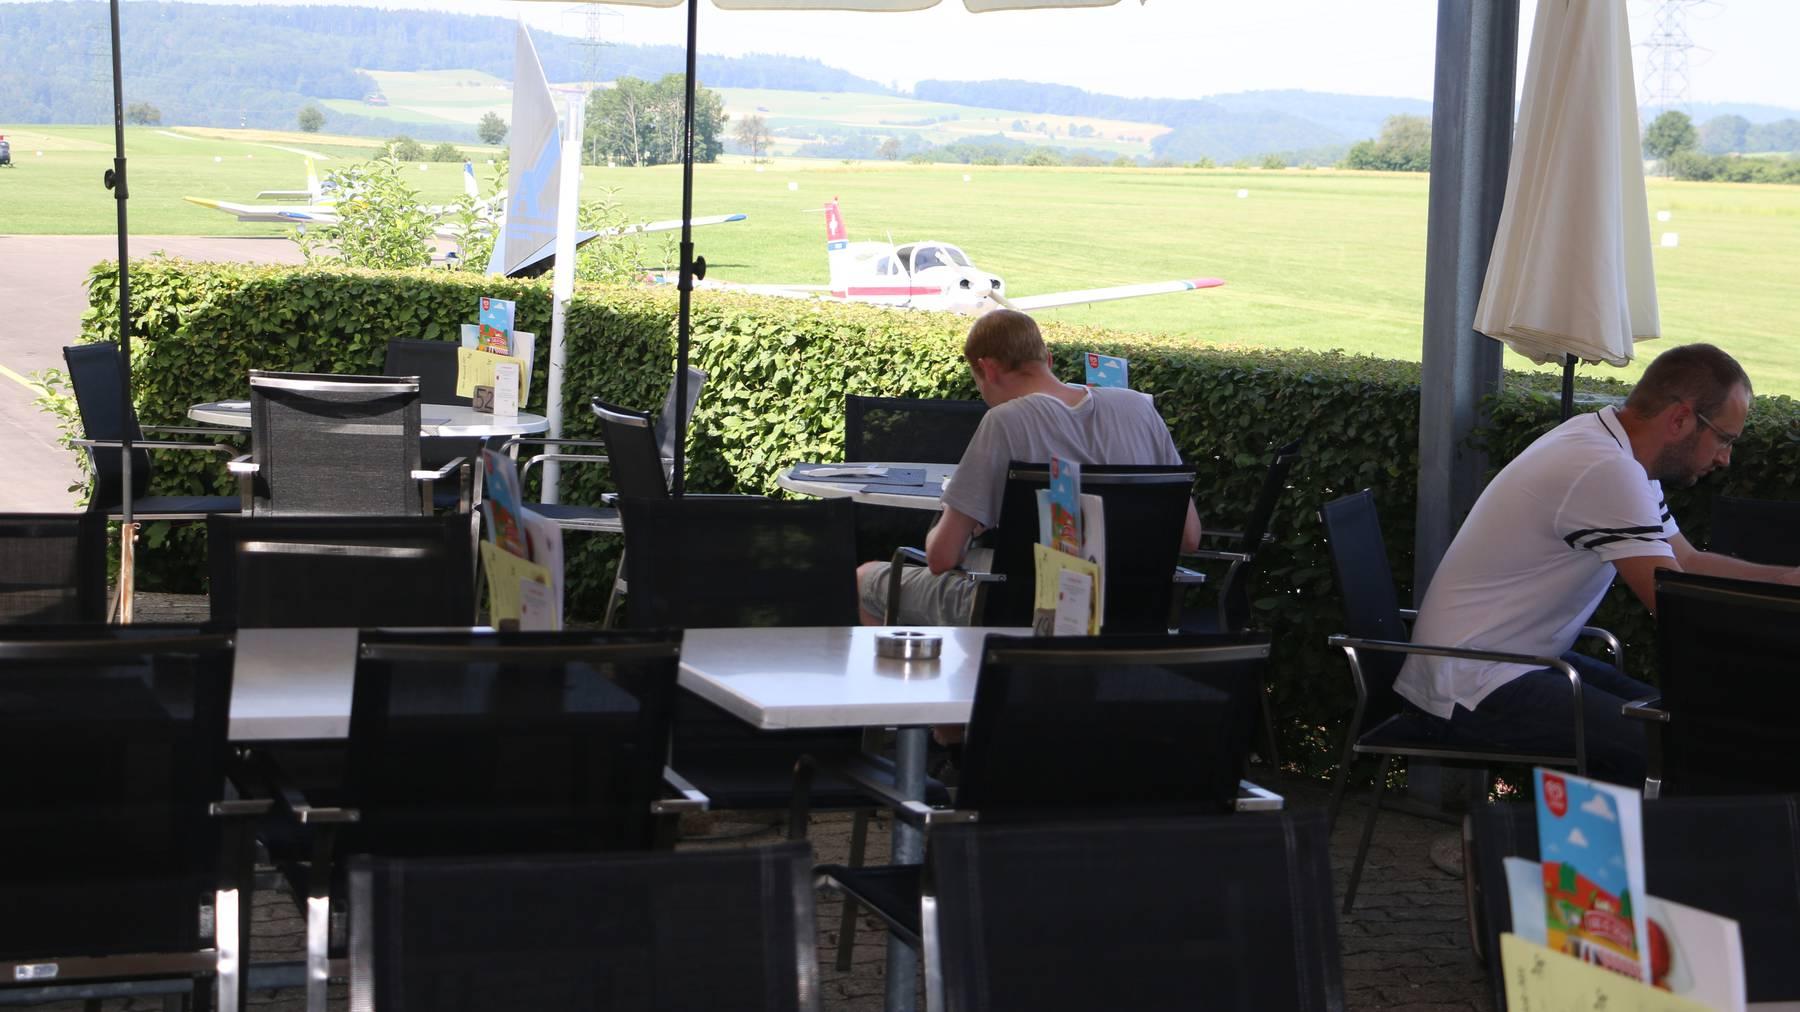 Restaurant Airpick, Schupfart